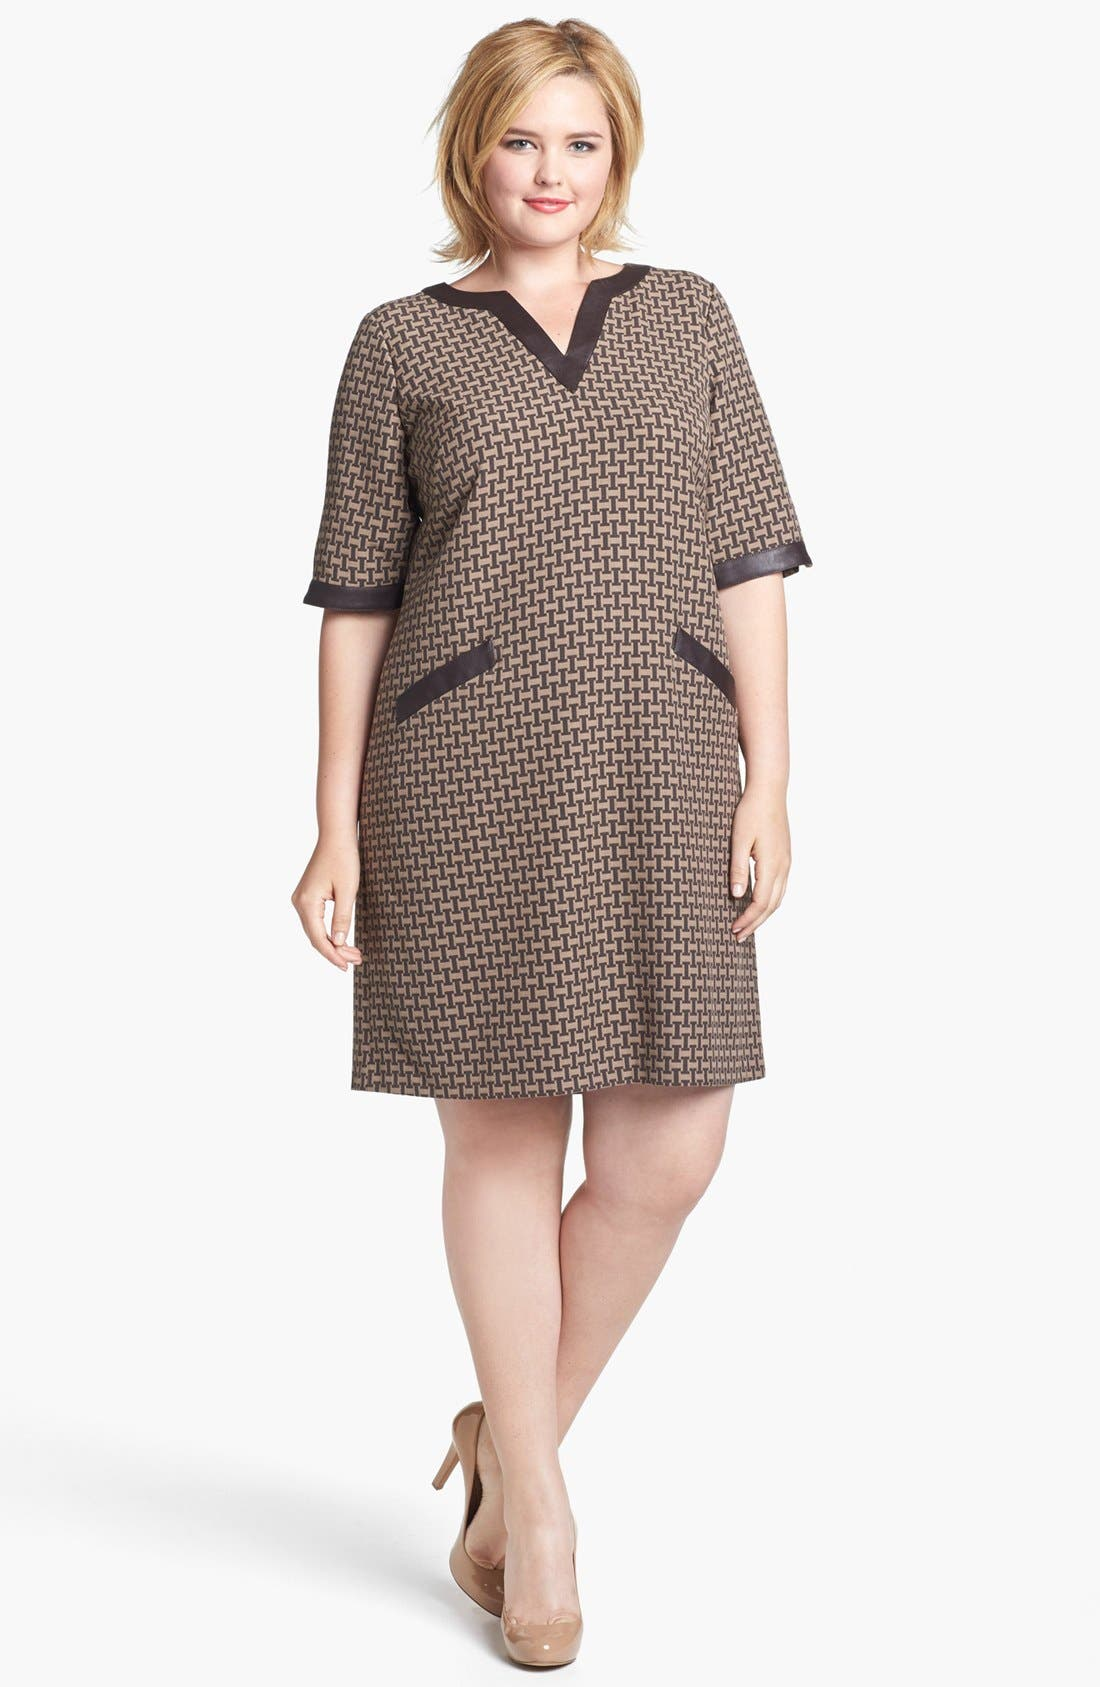 Alternate Image 1 Selected - Ivy & Blu Jacquard Shift Dress (Plus Size)